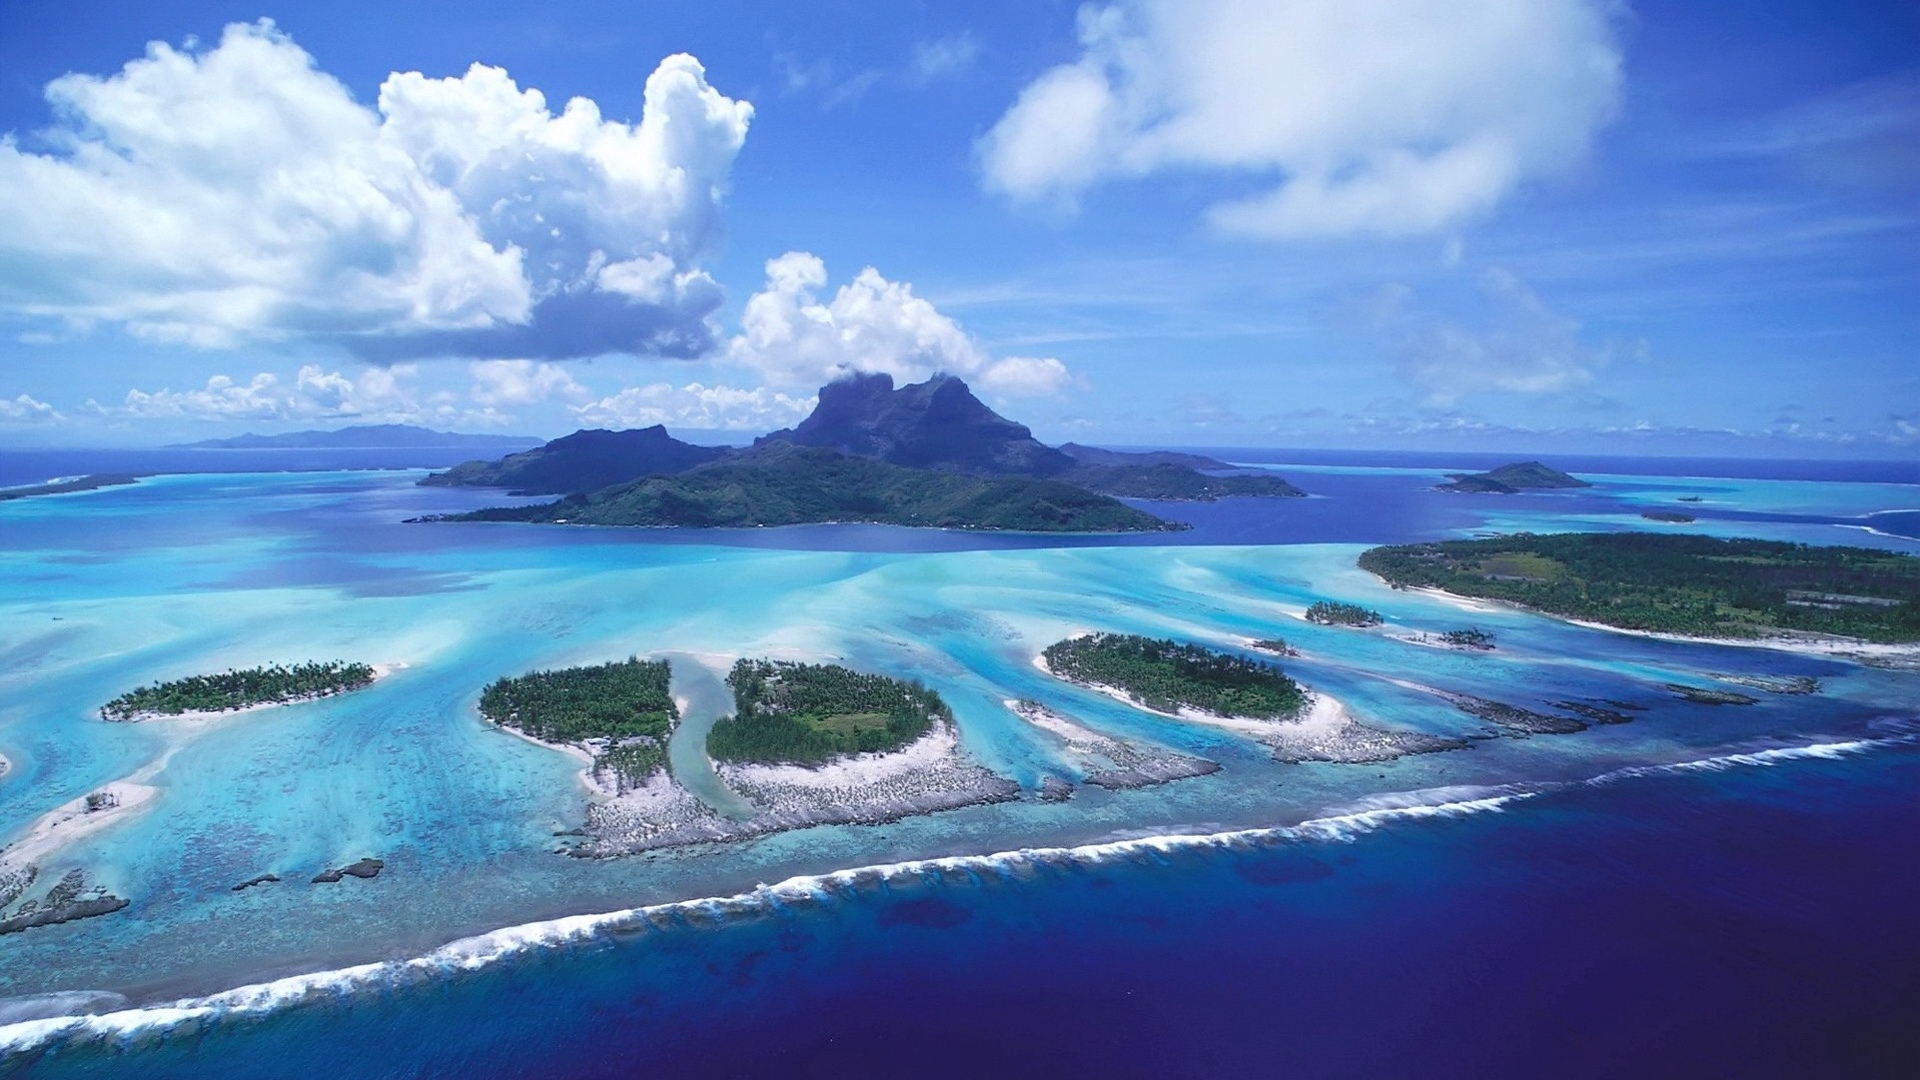 Hd 1920x1080 Cool Sea Islands Desktop Wallpapers Backgrounds 1920x1080